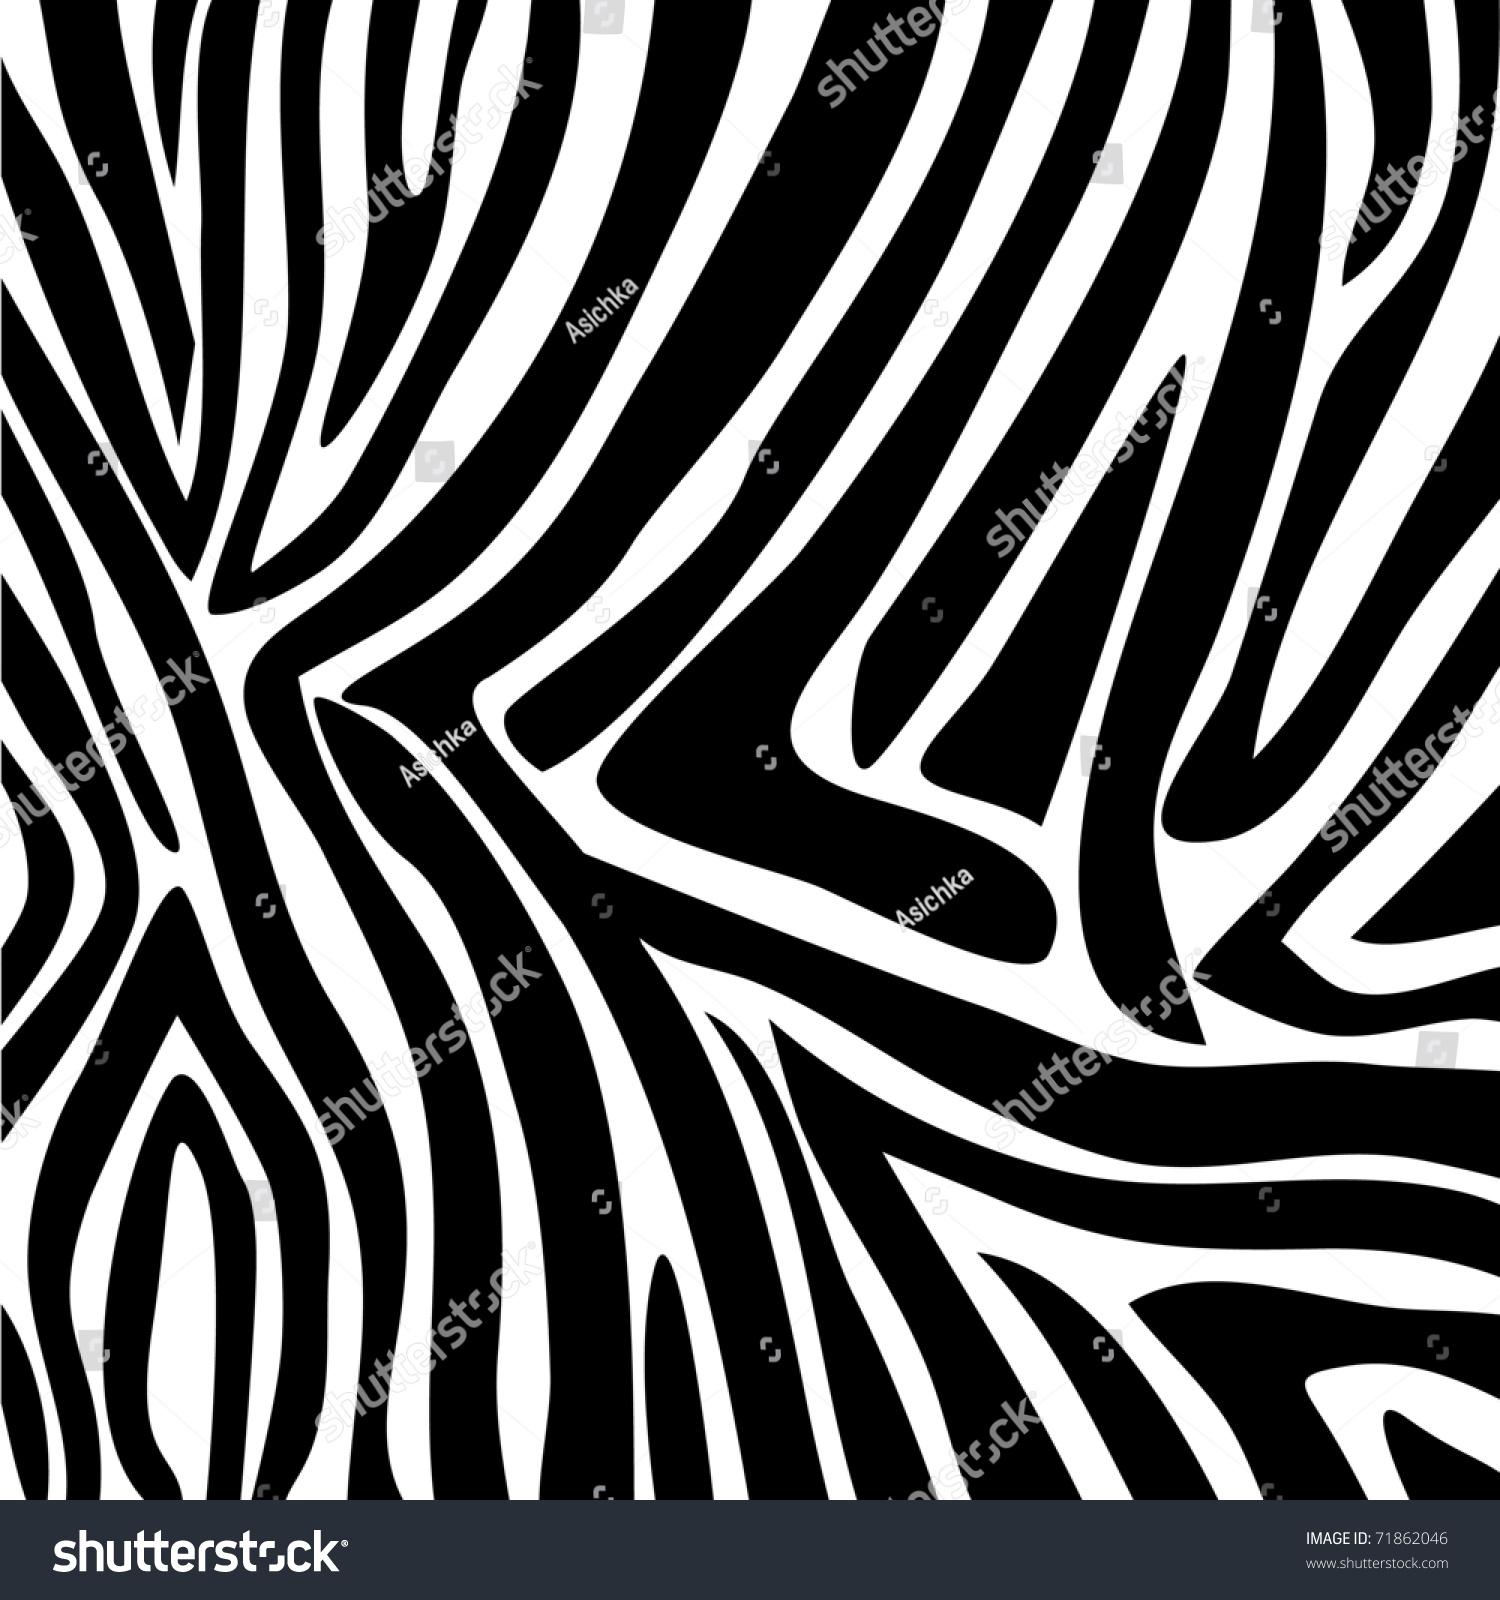 Zebra pattern vector - photo#12